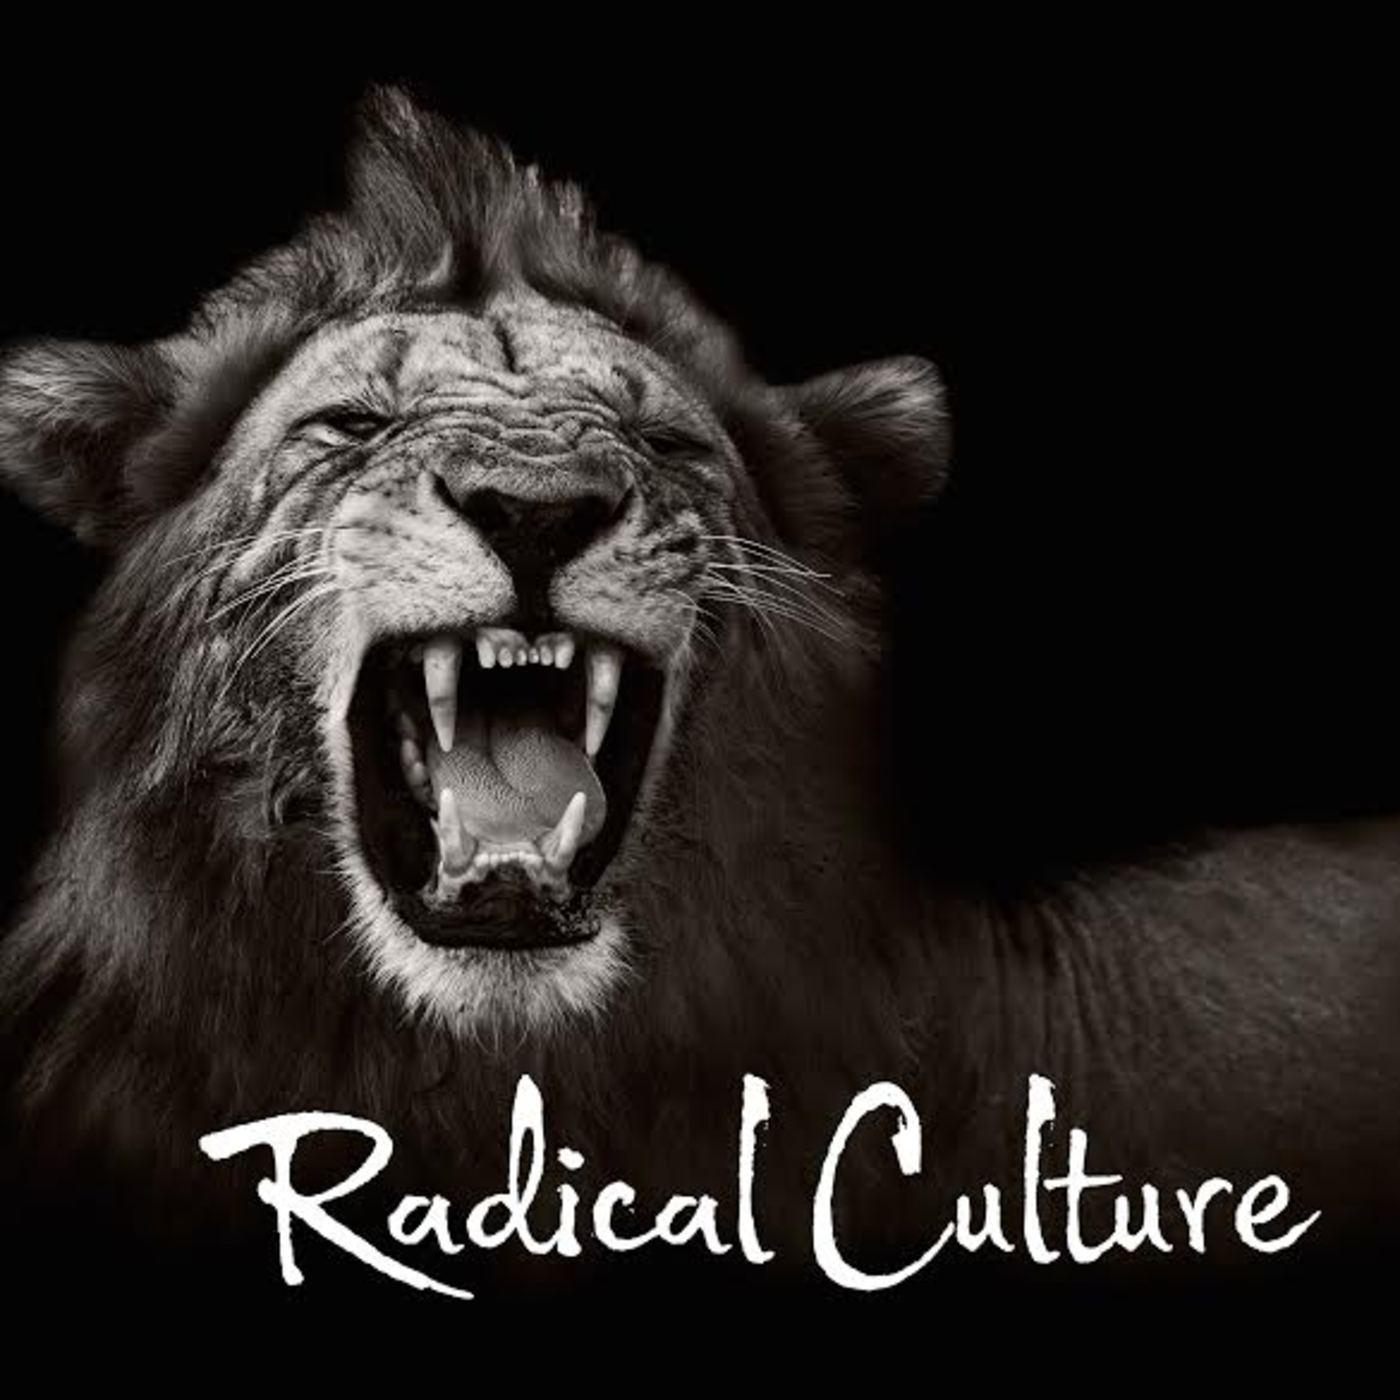 Radical Culture